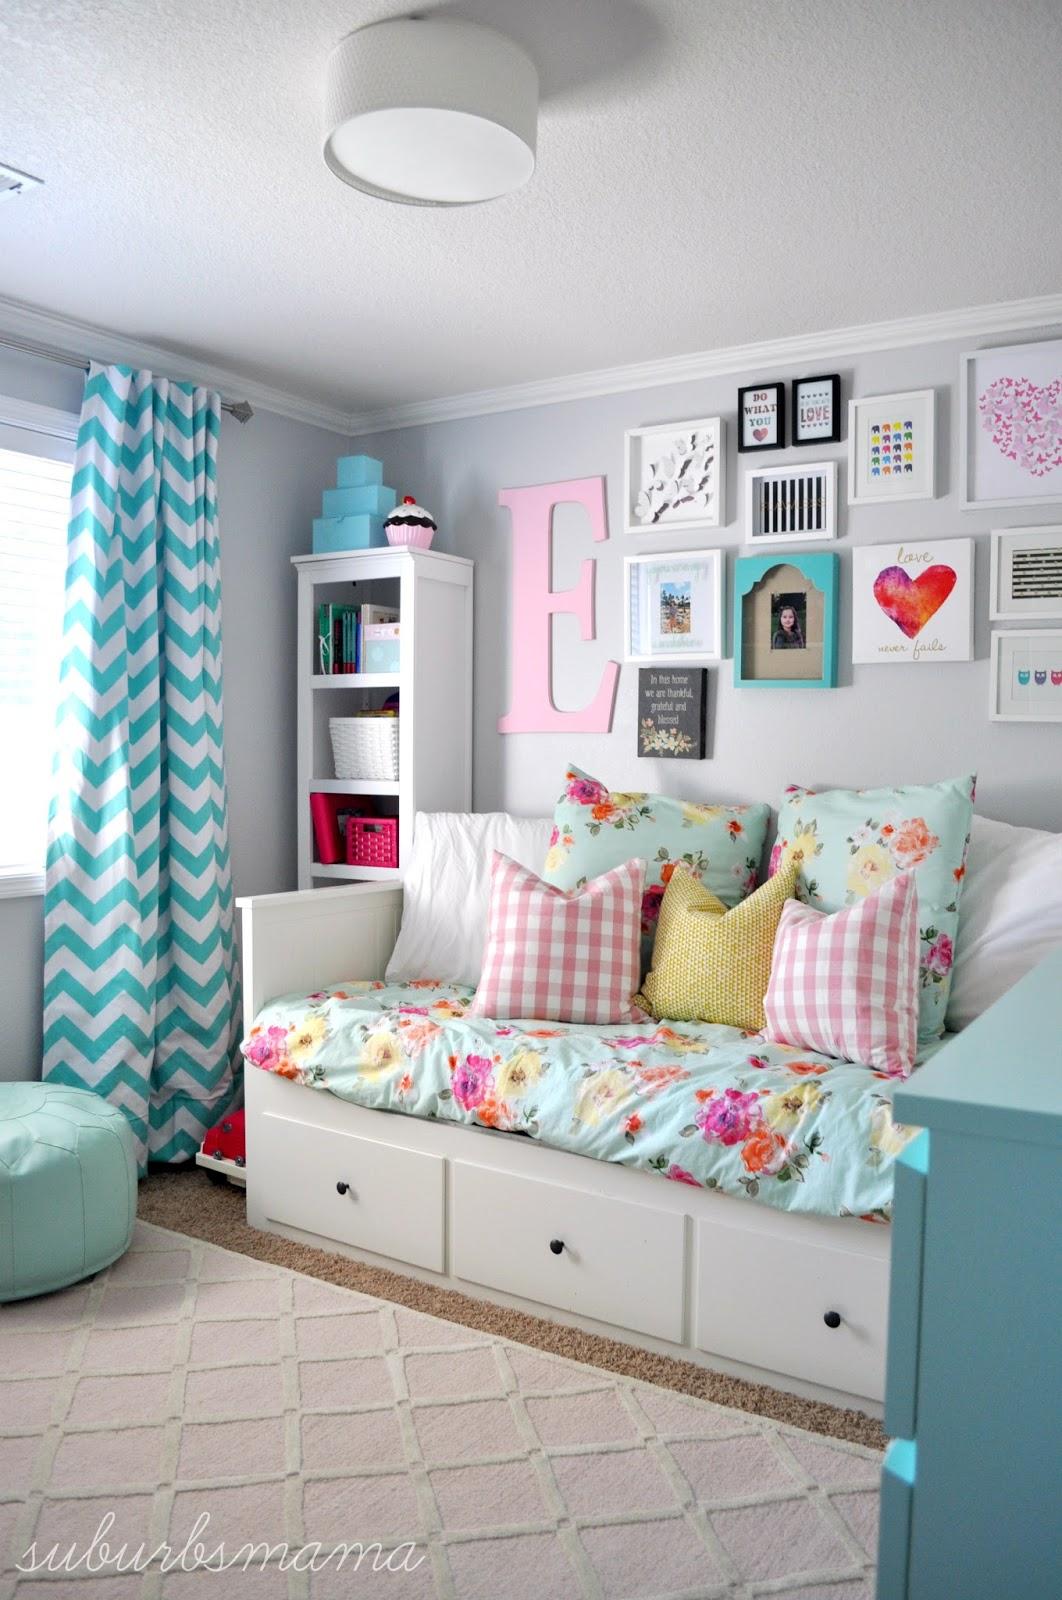 Best Girl Room Designs: Suburbs Mama: Big Girl Room